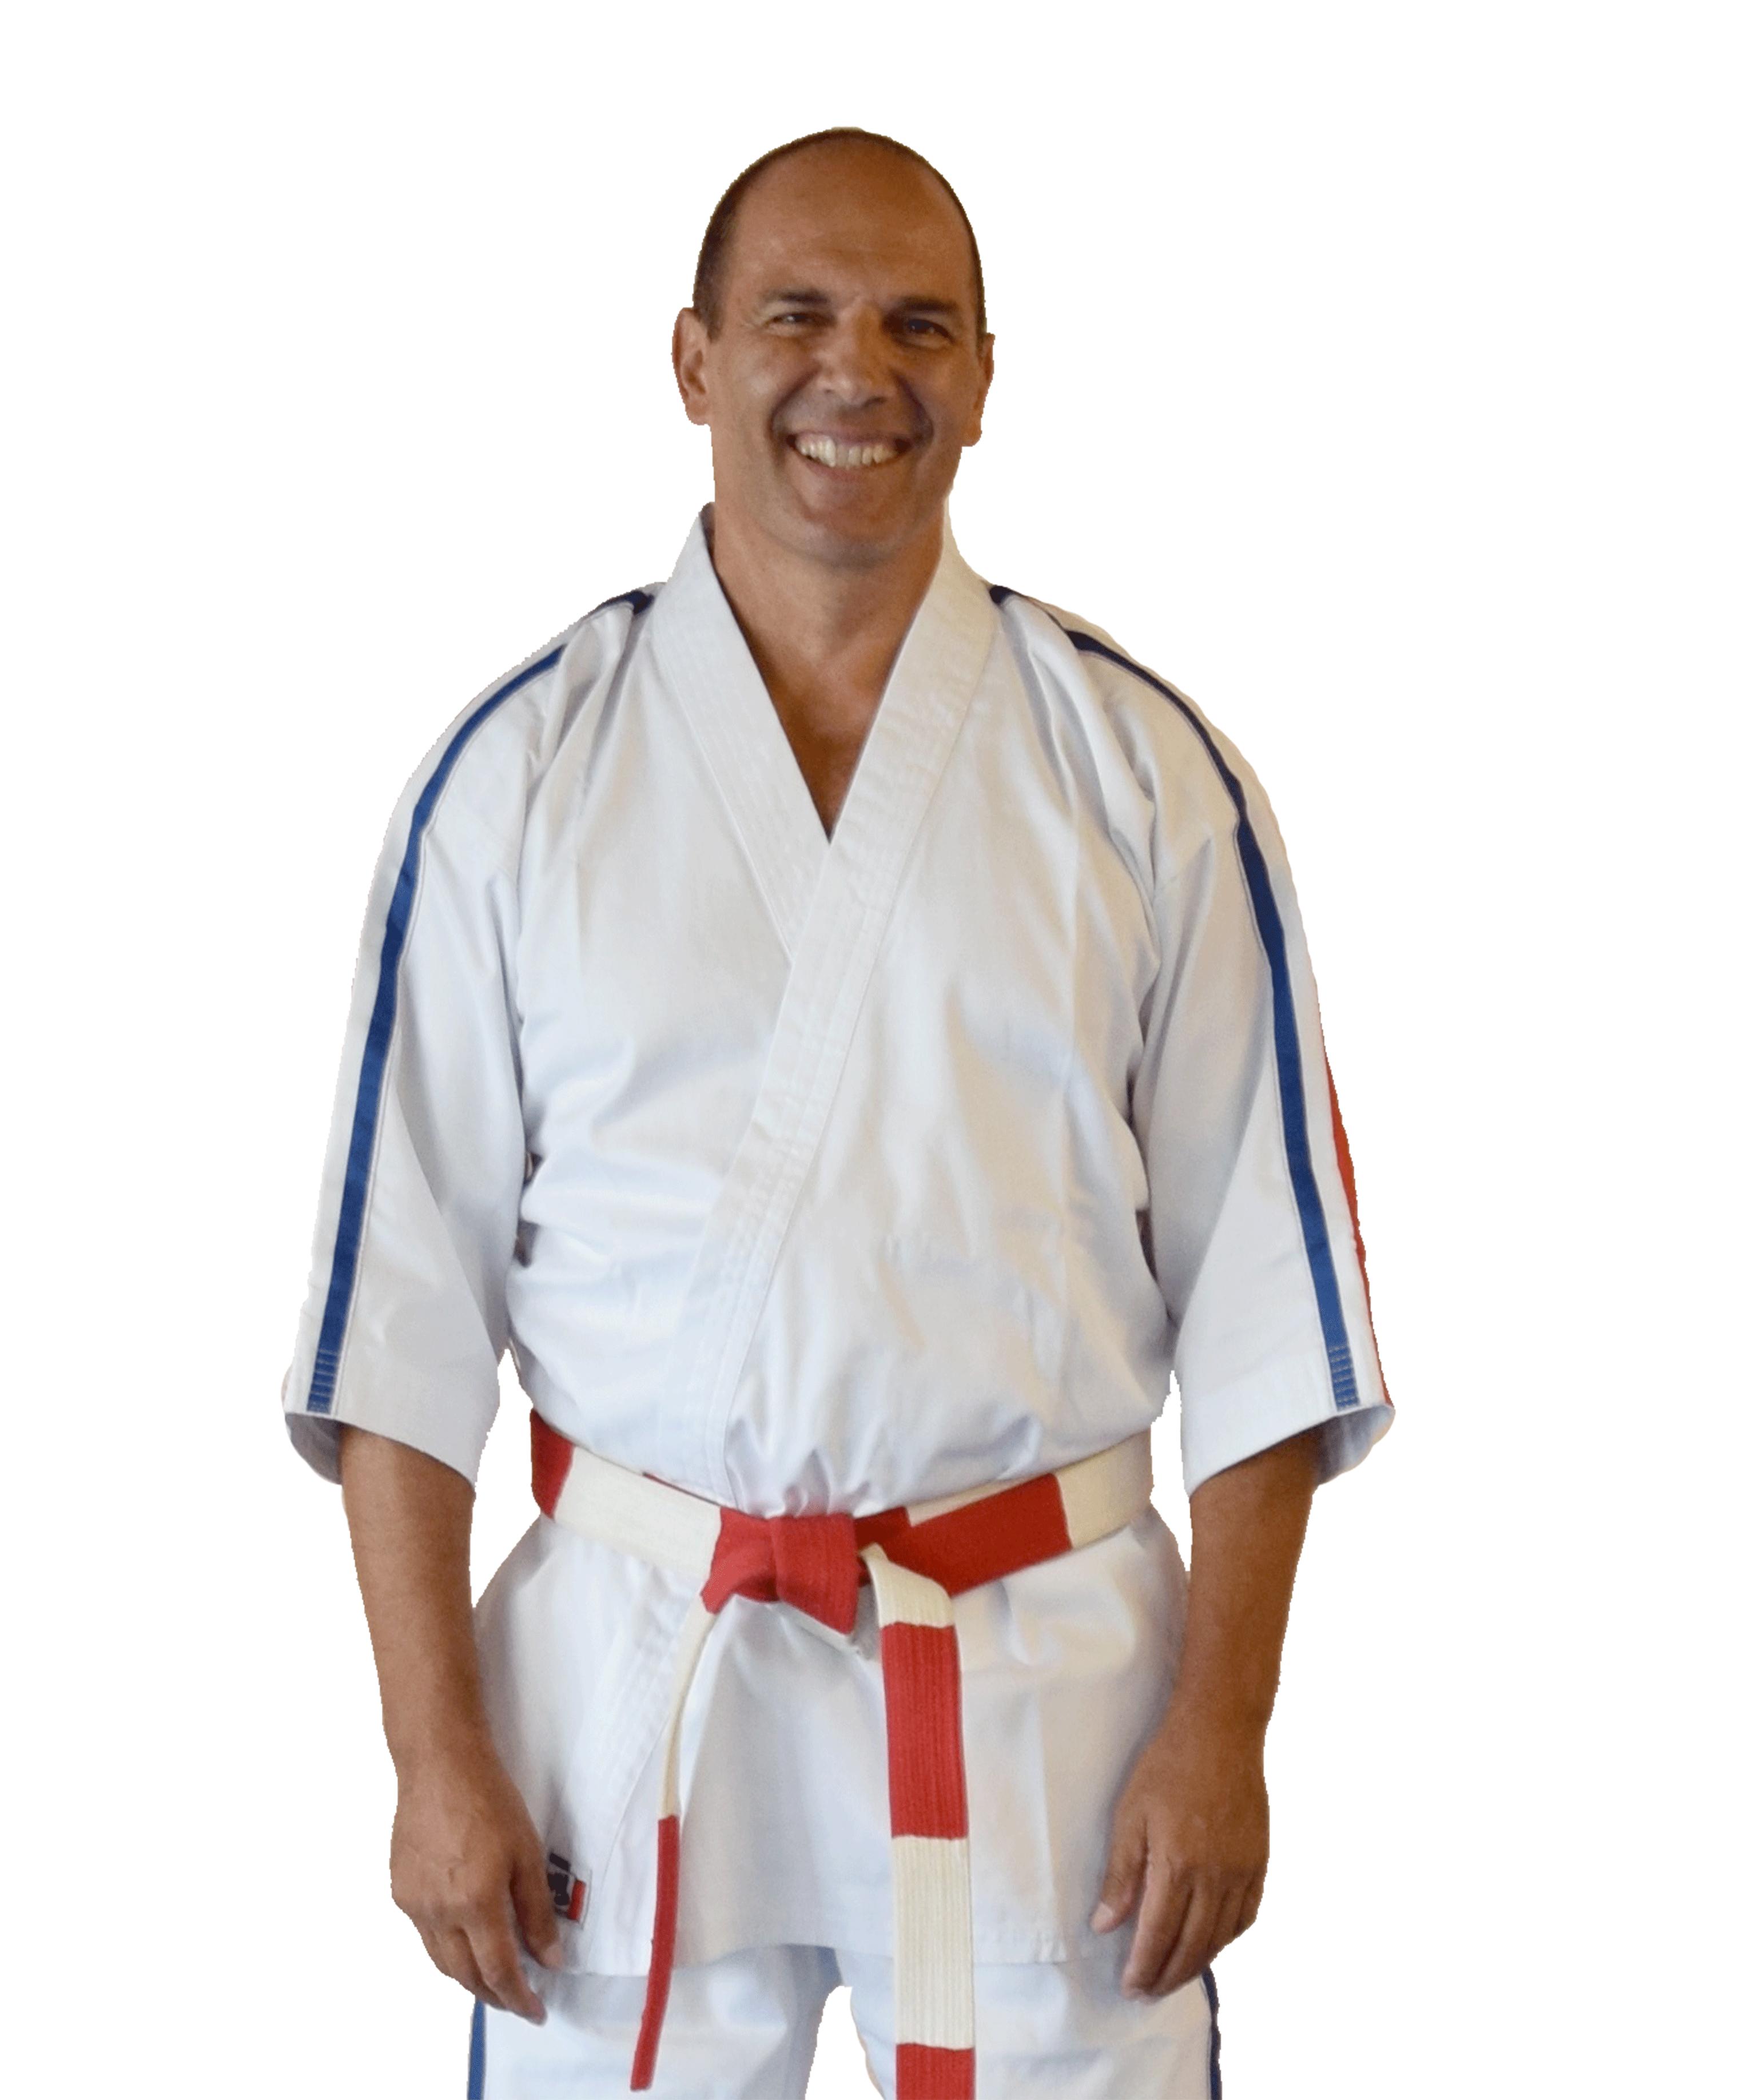 Jean-Luc LAMBERT